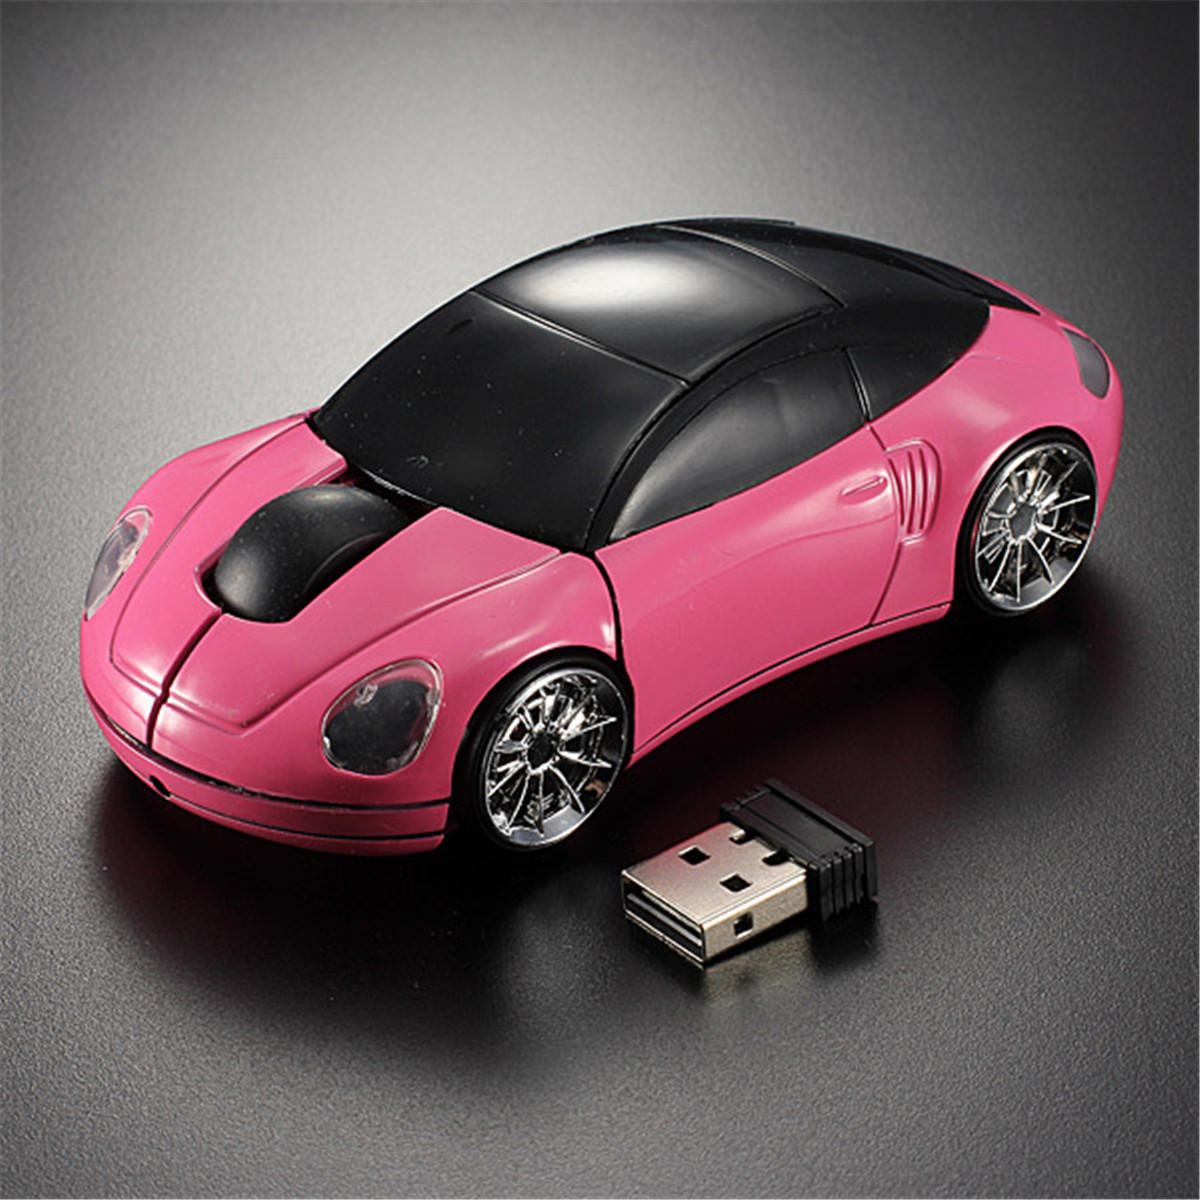 USB Wireless Optical Usb Mouse Mouse 2.4GHz 1600DPI 3D Car Shape Mice for Laptop PC